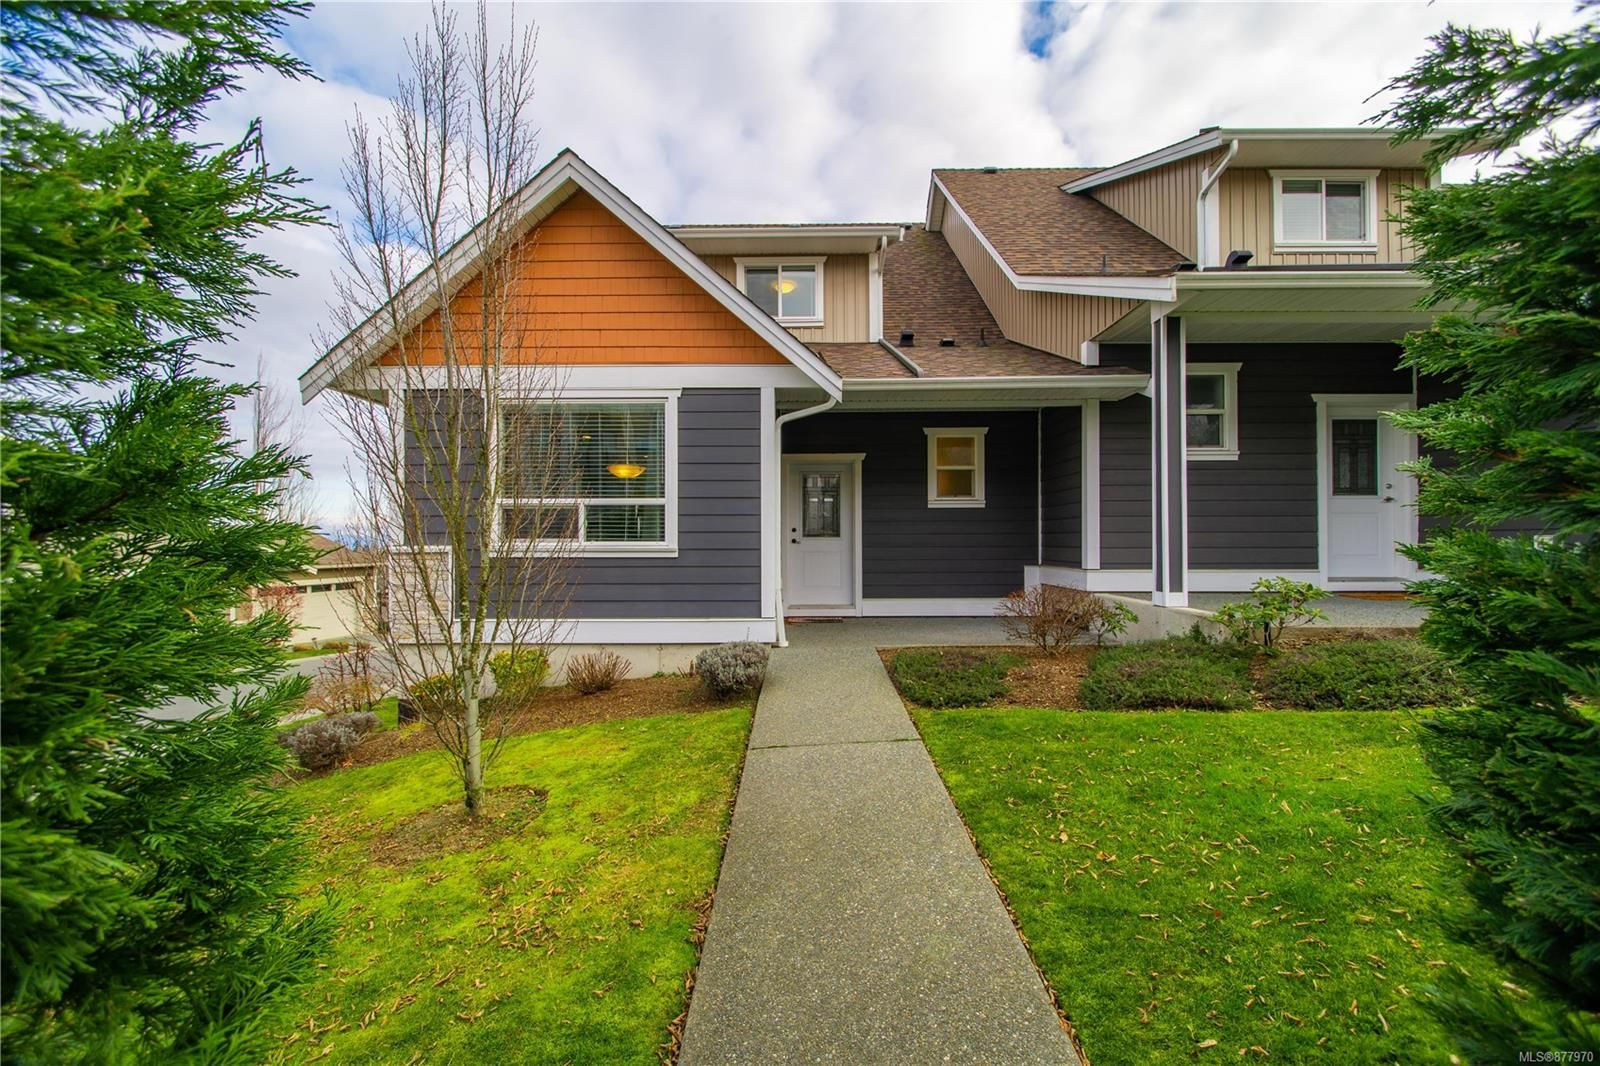 Main Photo: 6193 Washington Way in : Na North Nanaimo Row/Townhouse for sale (Nanaimo)  : MLS®# 877970